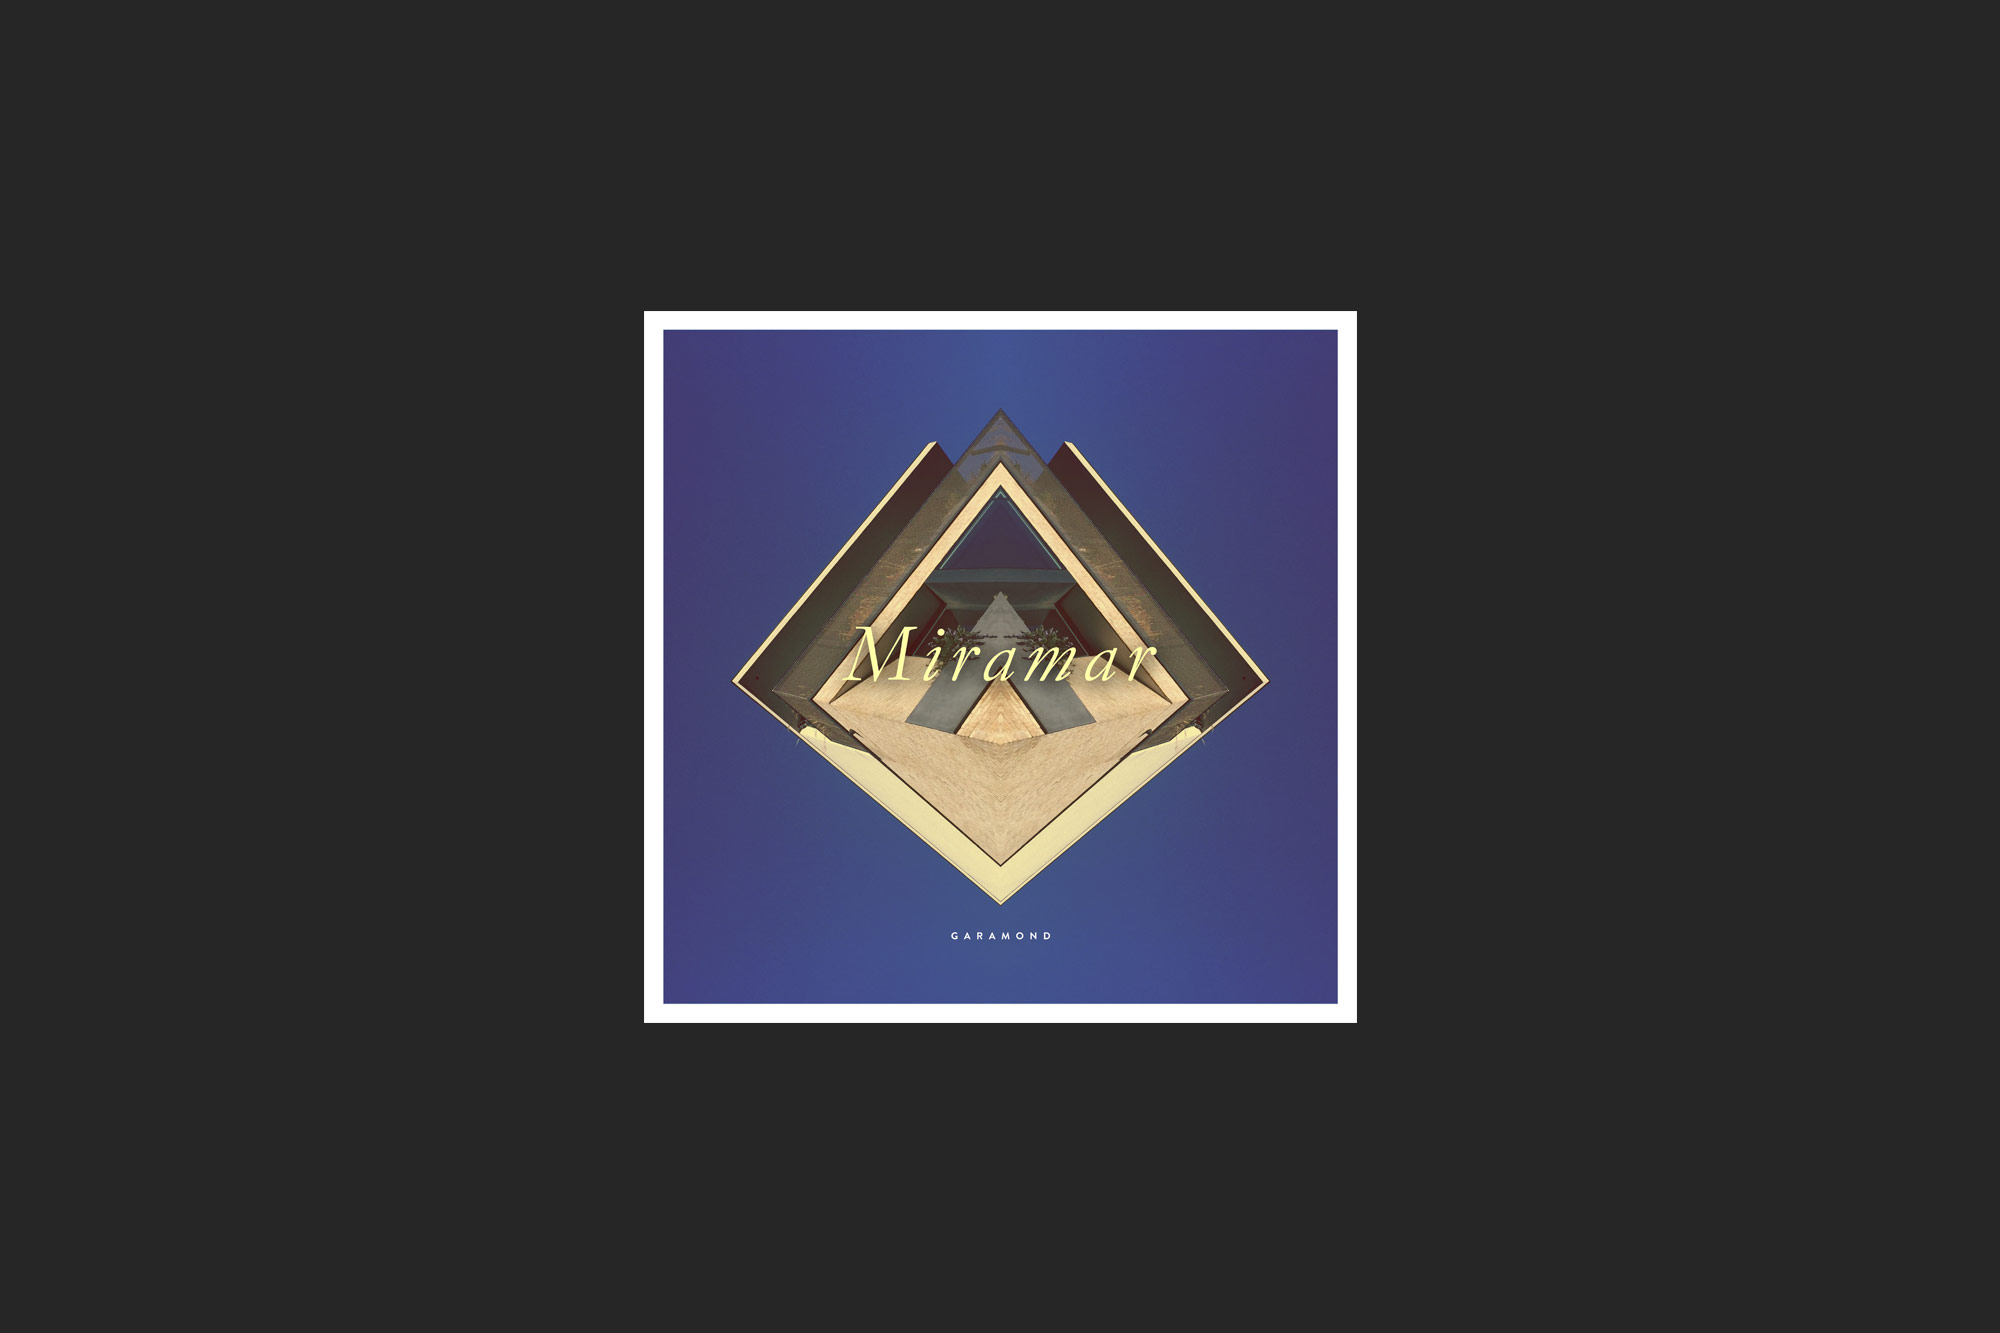 gareth-paul-jones-studio-music-design-garamond-music-monolith-ep-cs-05